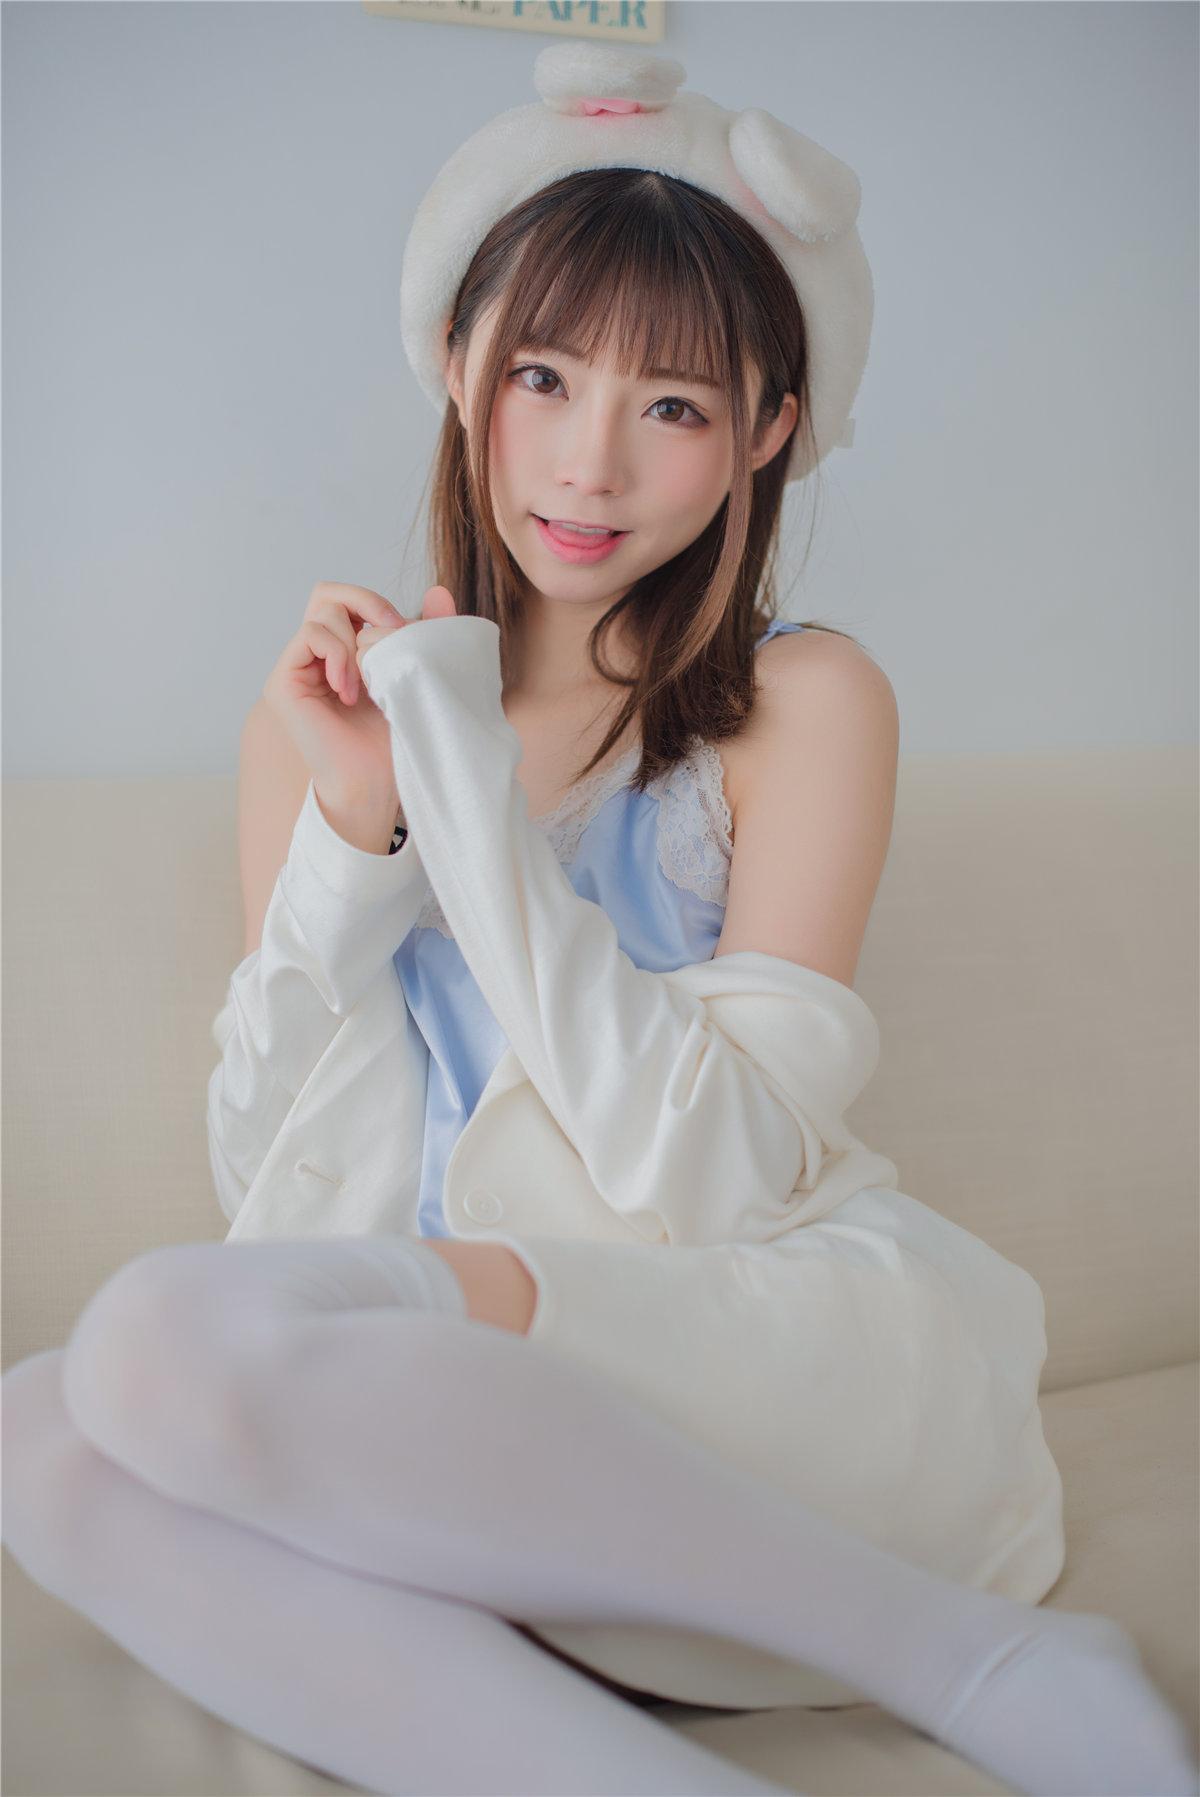 Kitaro_绮太郎 可爱的桔子酱私房写真